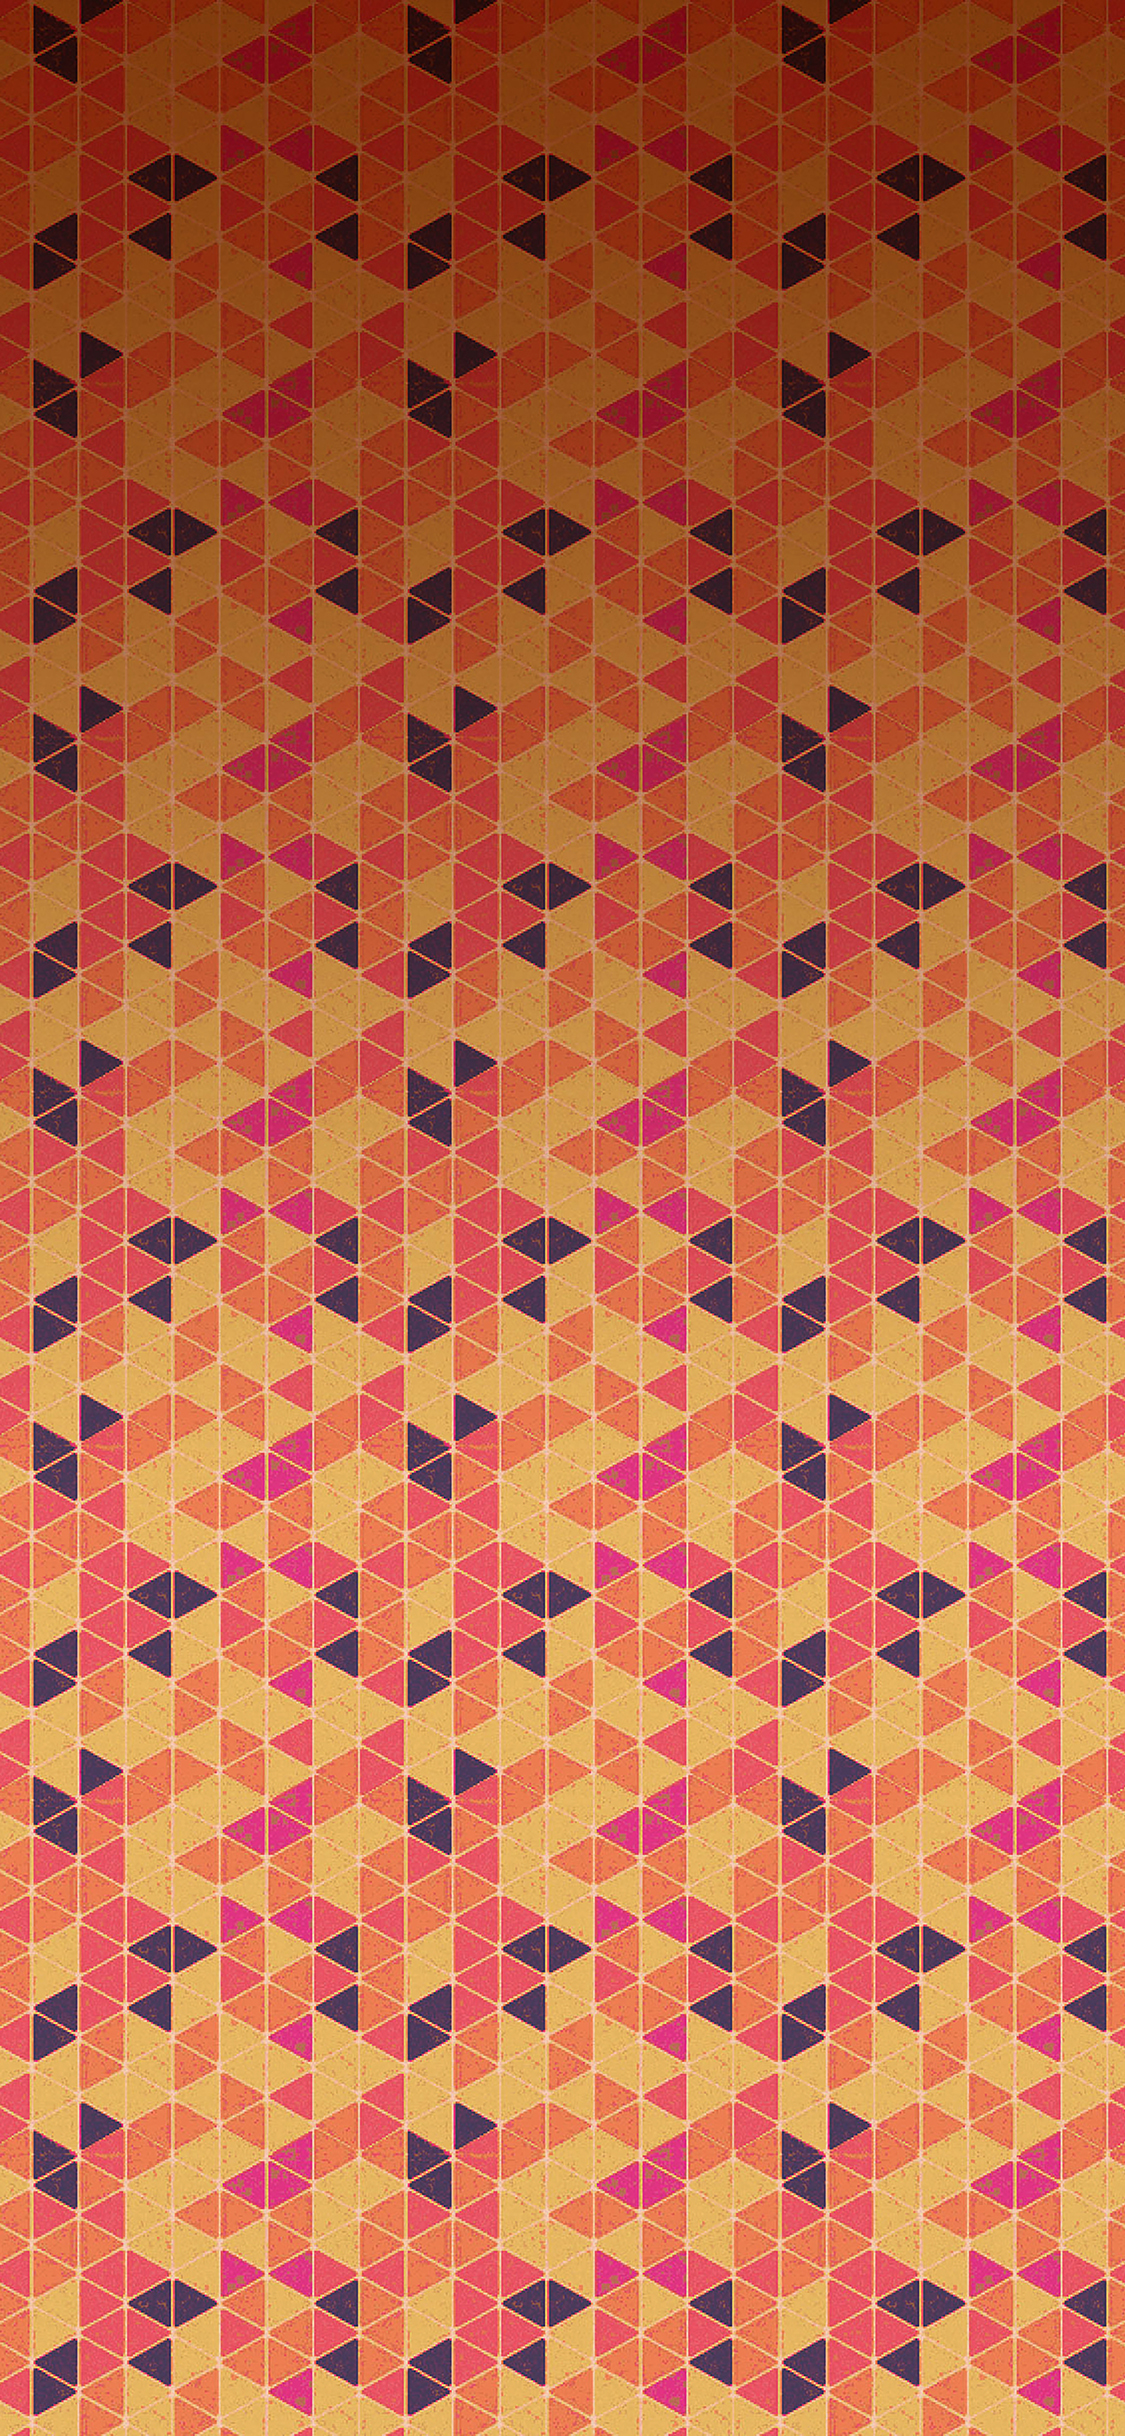 iPhoneXpapers.com-Apple-iPhone-wallpaper-vb51-wallpaper-gplay-orange-pattern